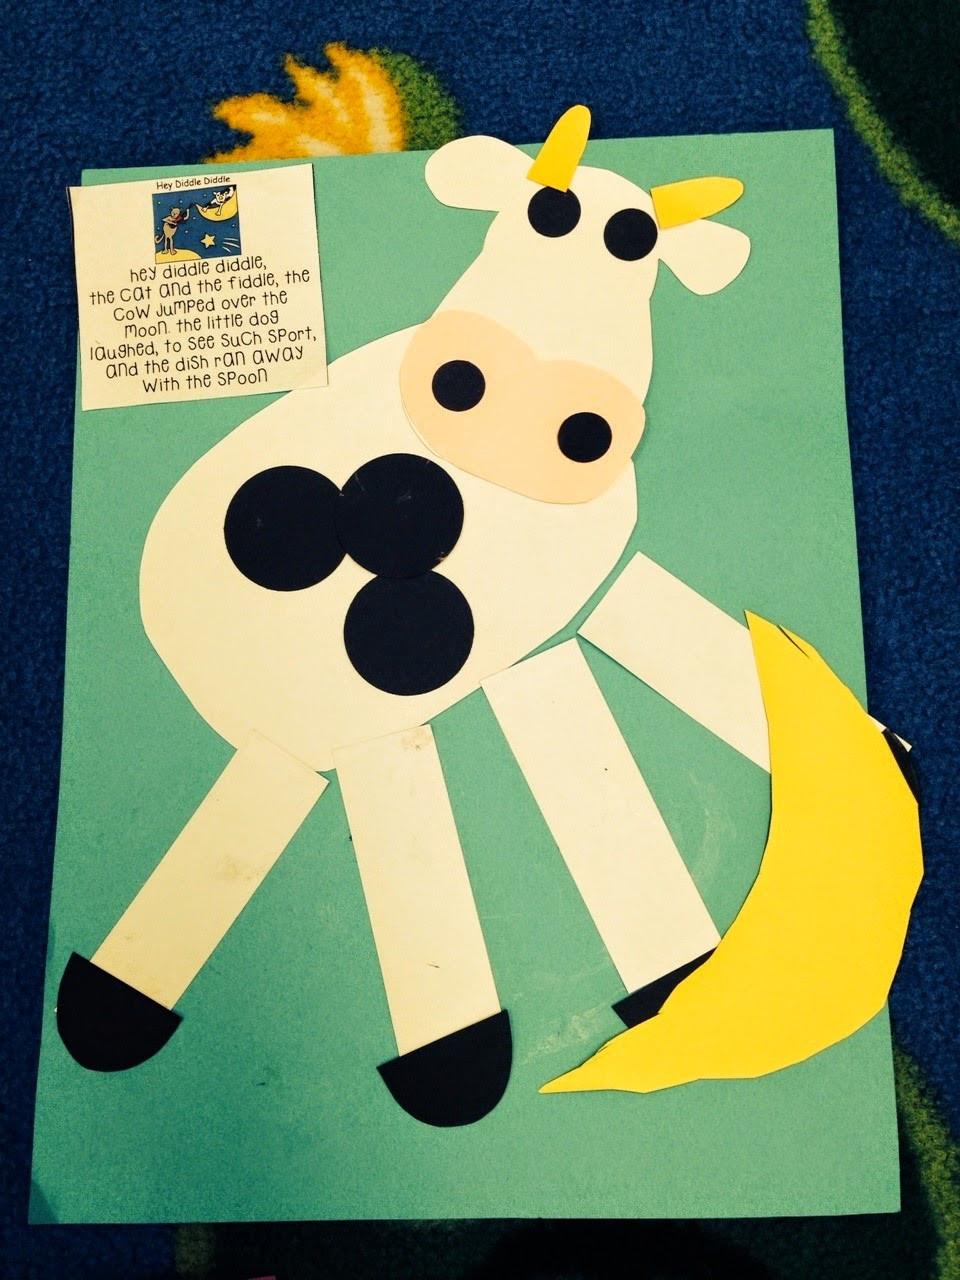 Best ideas about Preschoolers Arts And Crafts Ideas . Save or Pin Preschool Wonders Nursery Rhymes Second Verse Now.